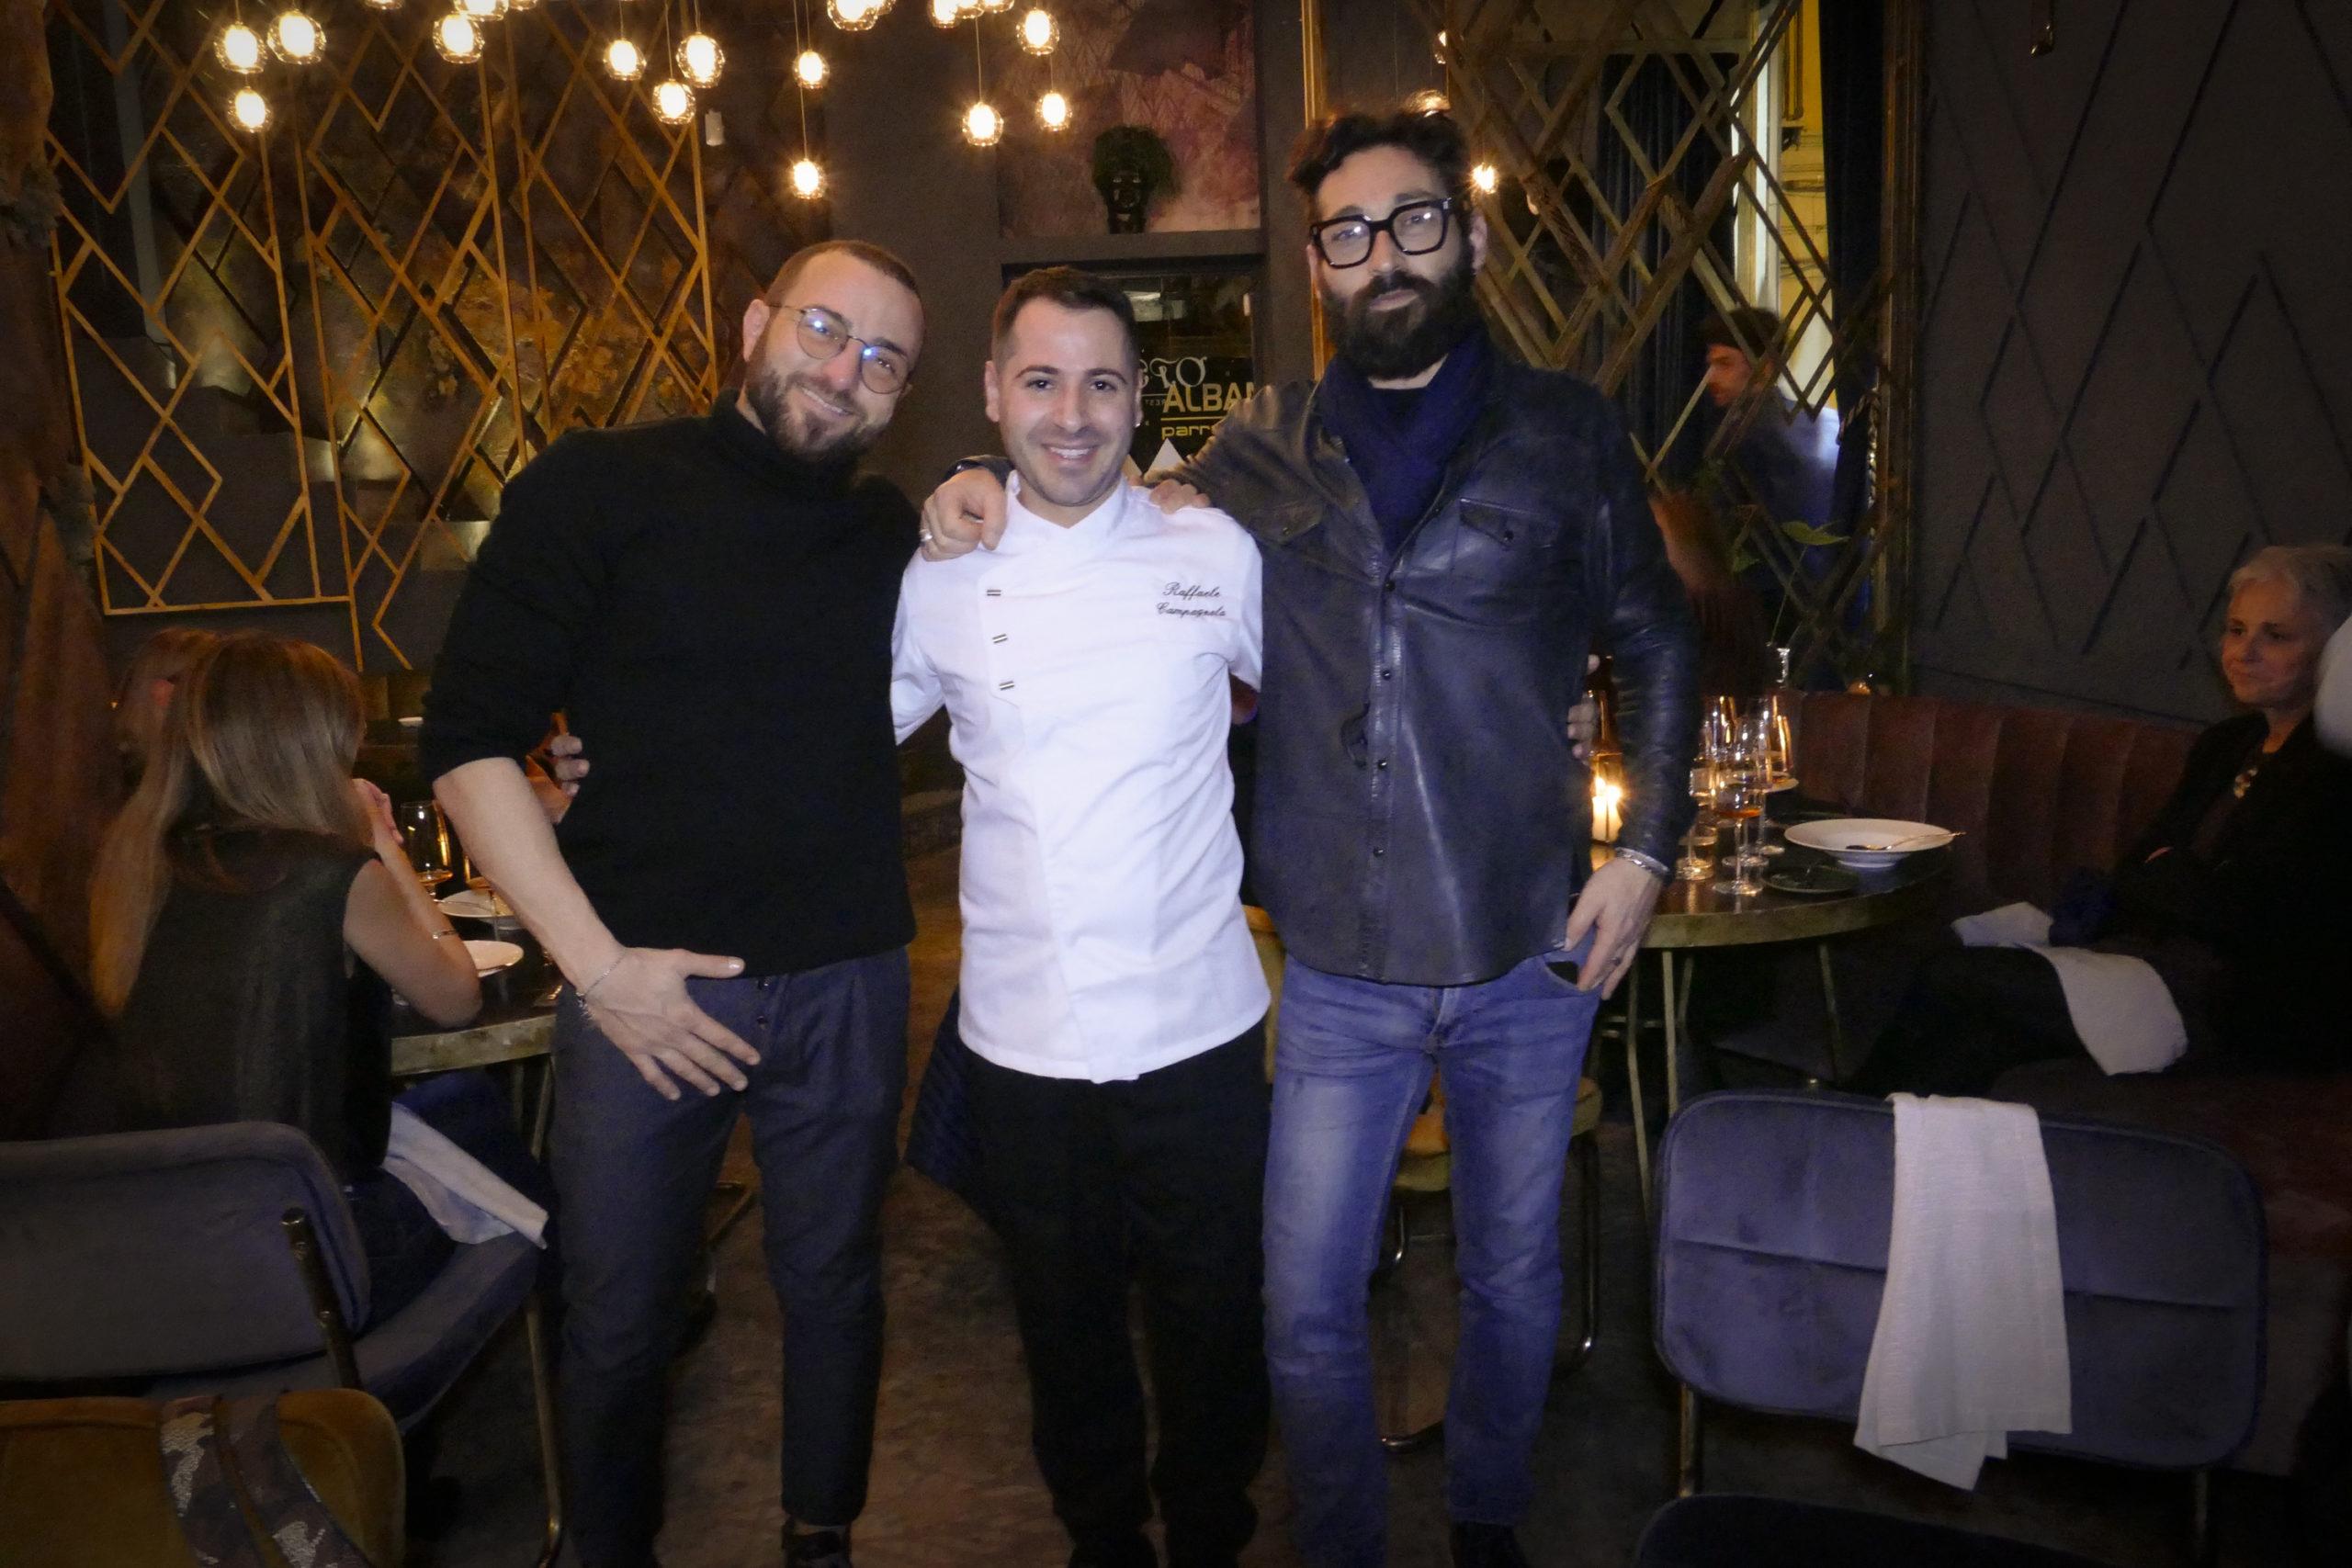 Napoli a tavola e atmosfere newyorkesi da Opera Restaurant 8